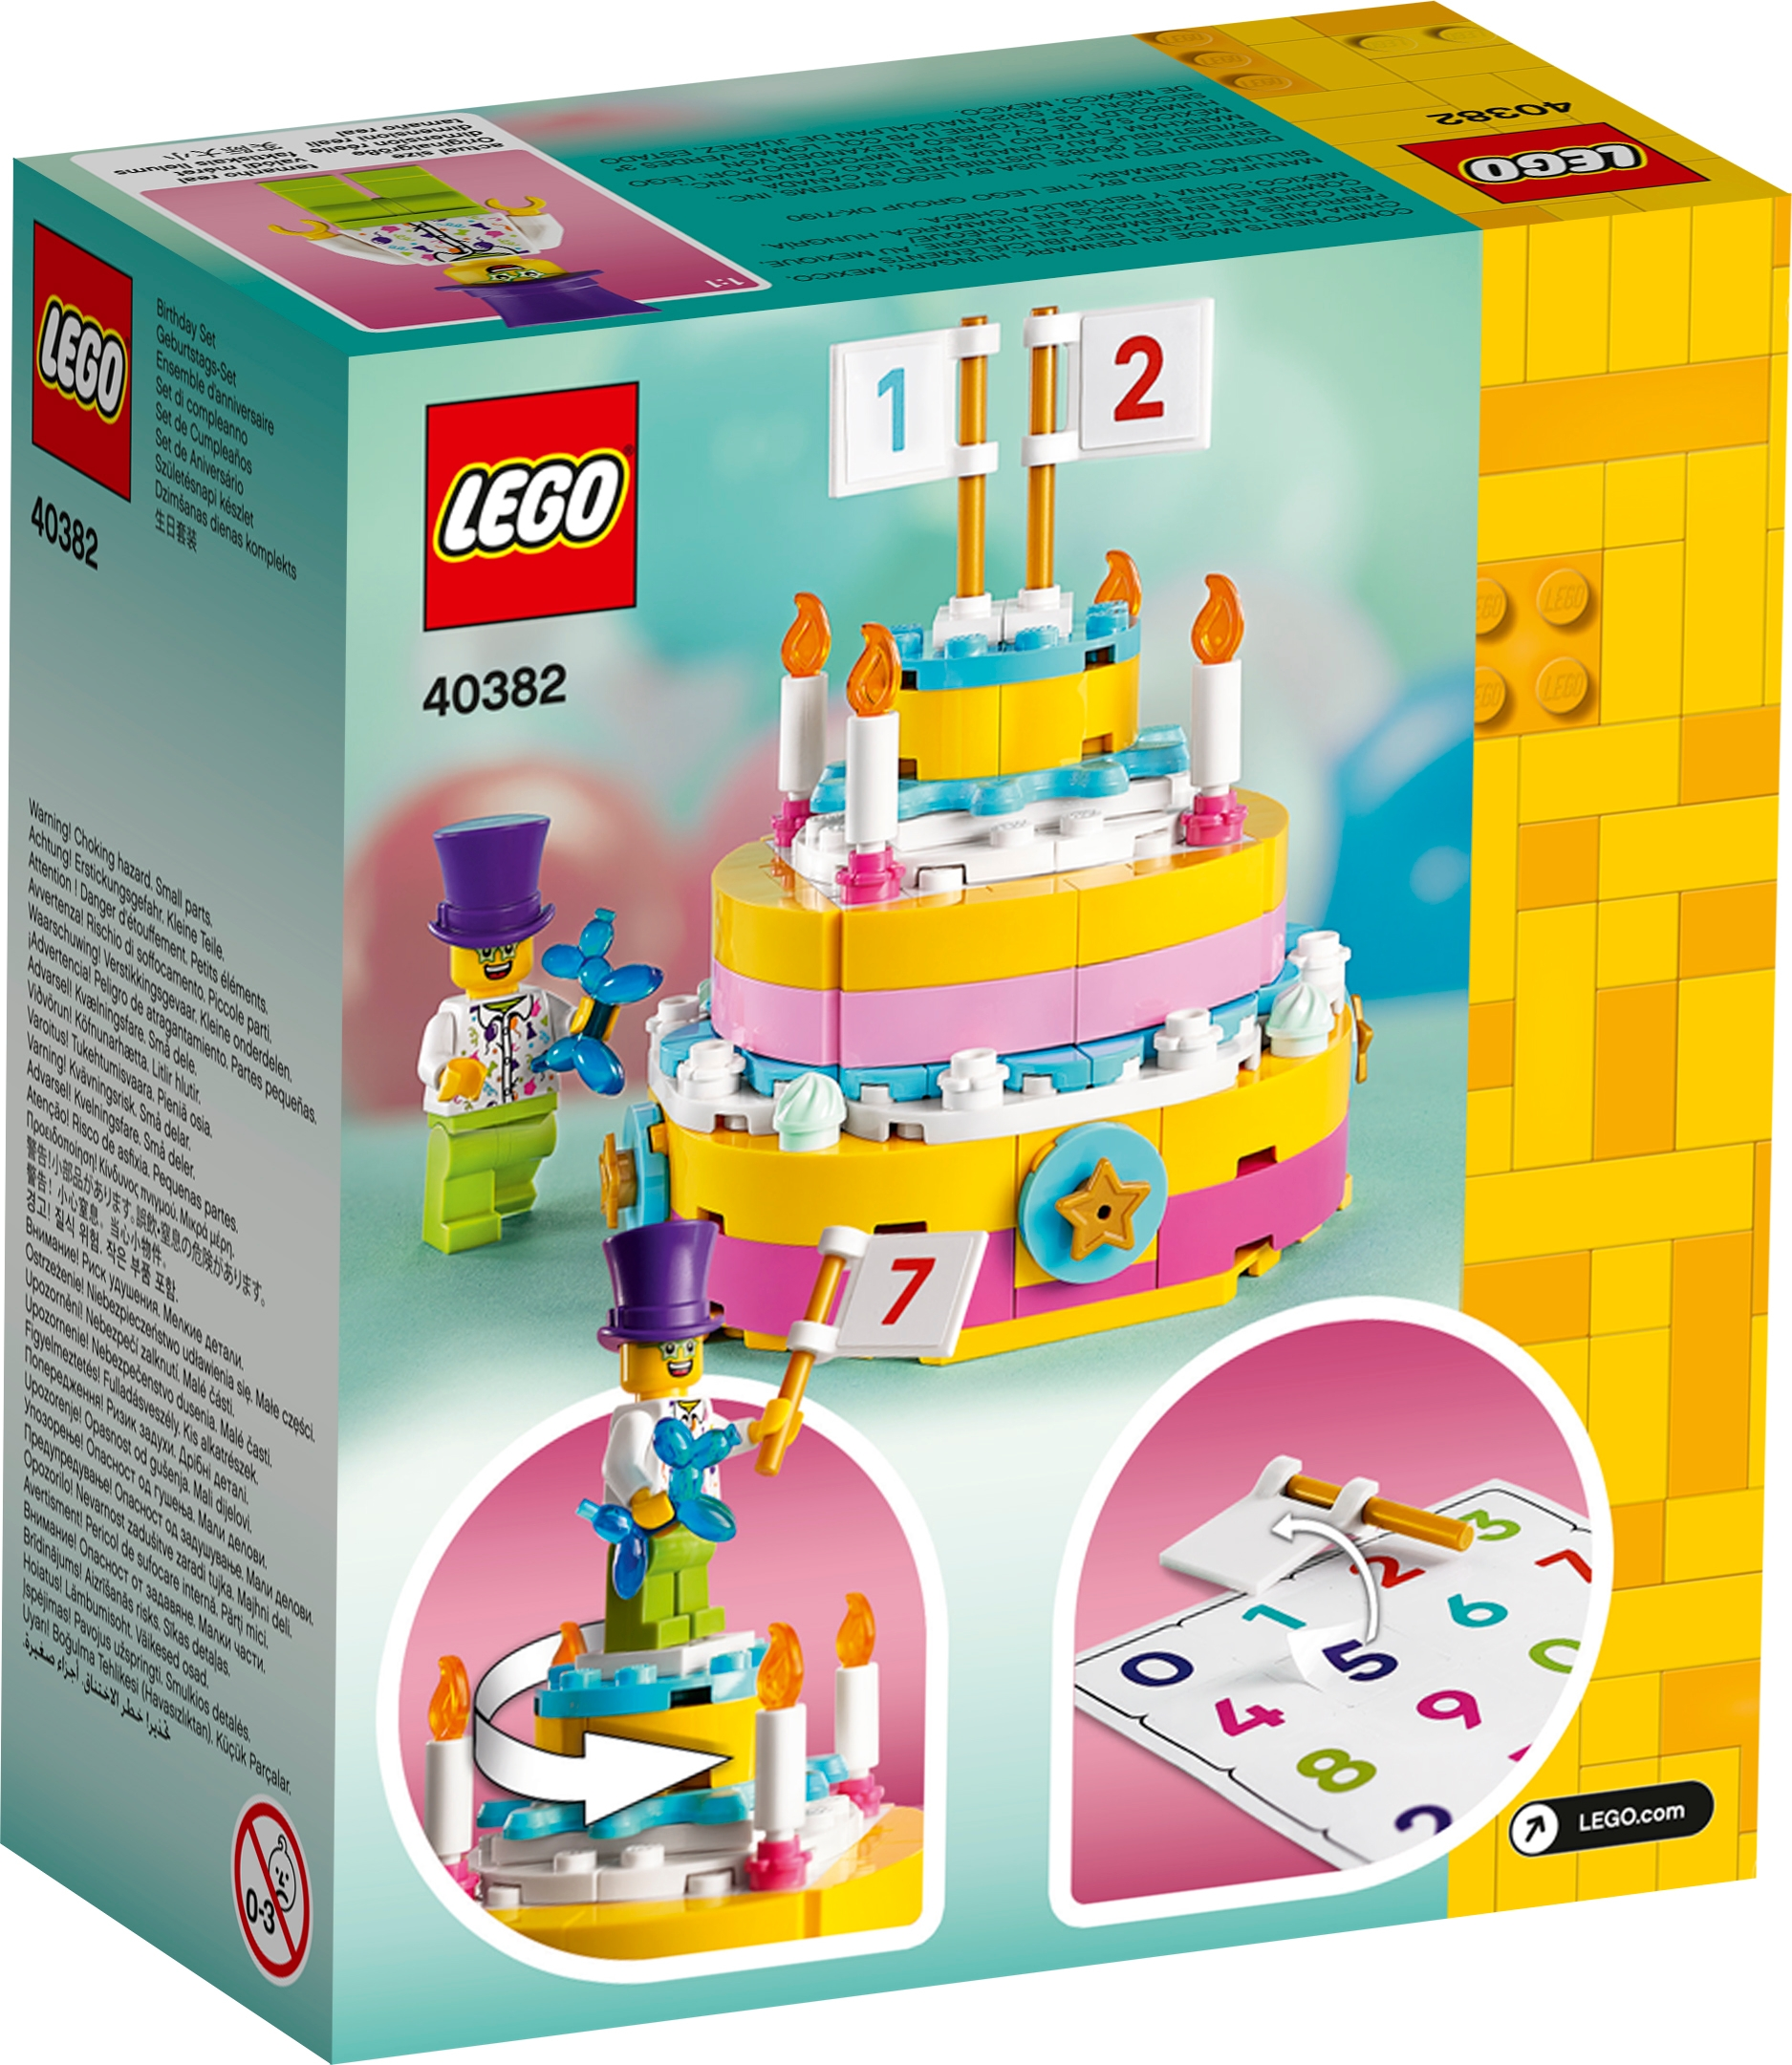 Lego Birthday Cake Decoration Set NEW Exclusive 2020 40382 141 pcs